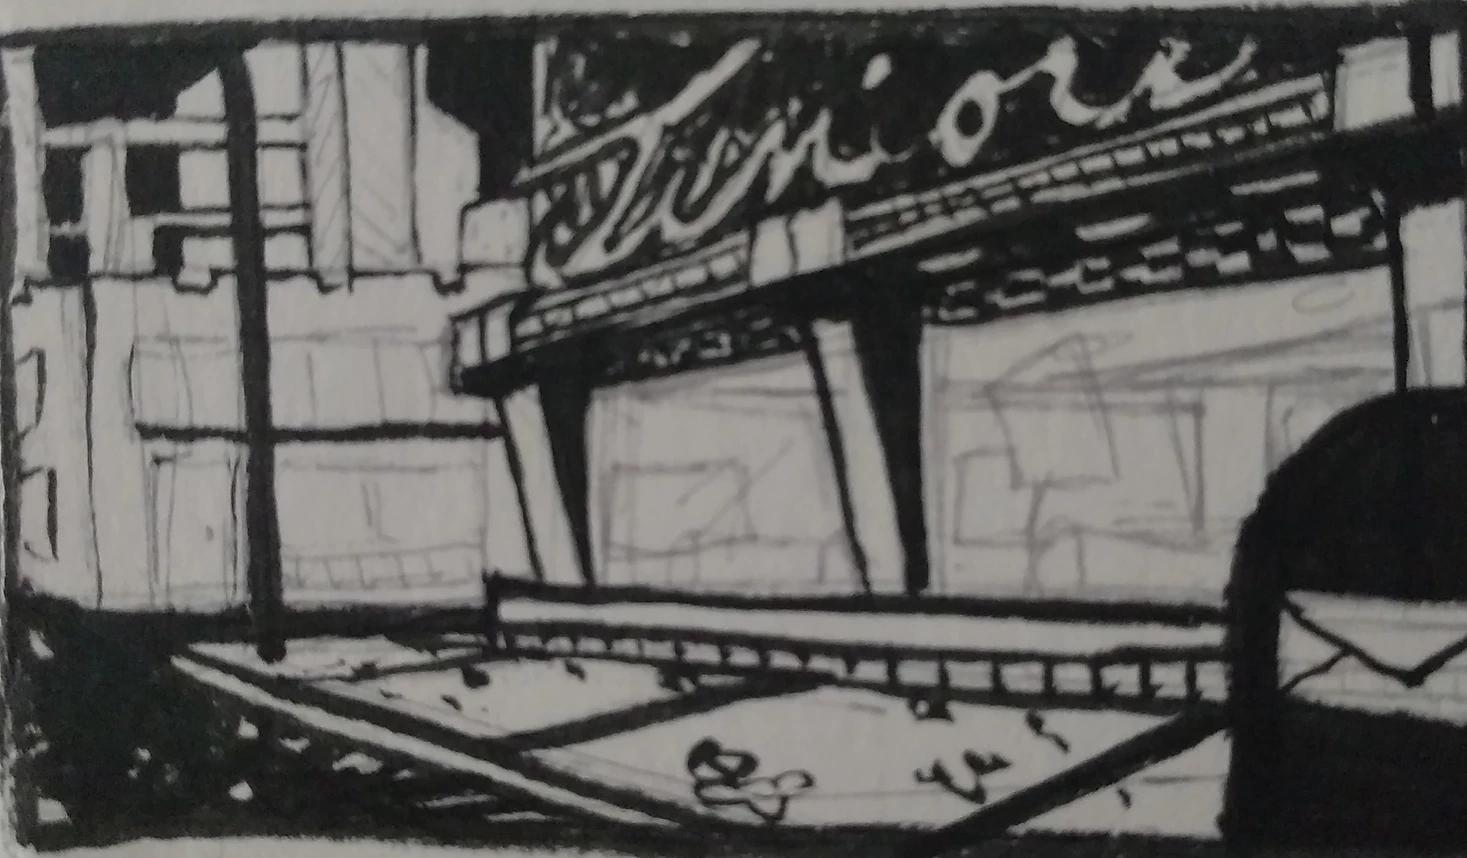 A rough sketch